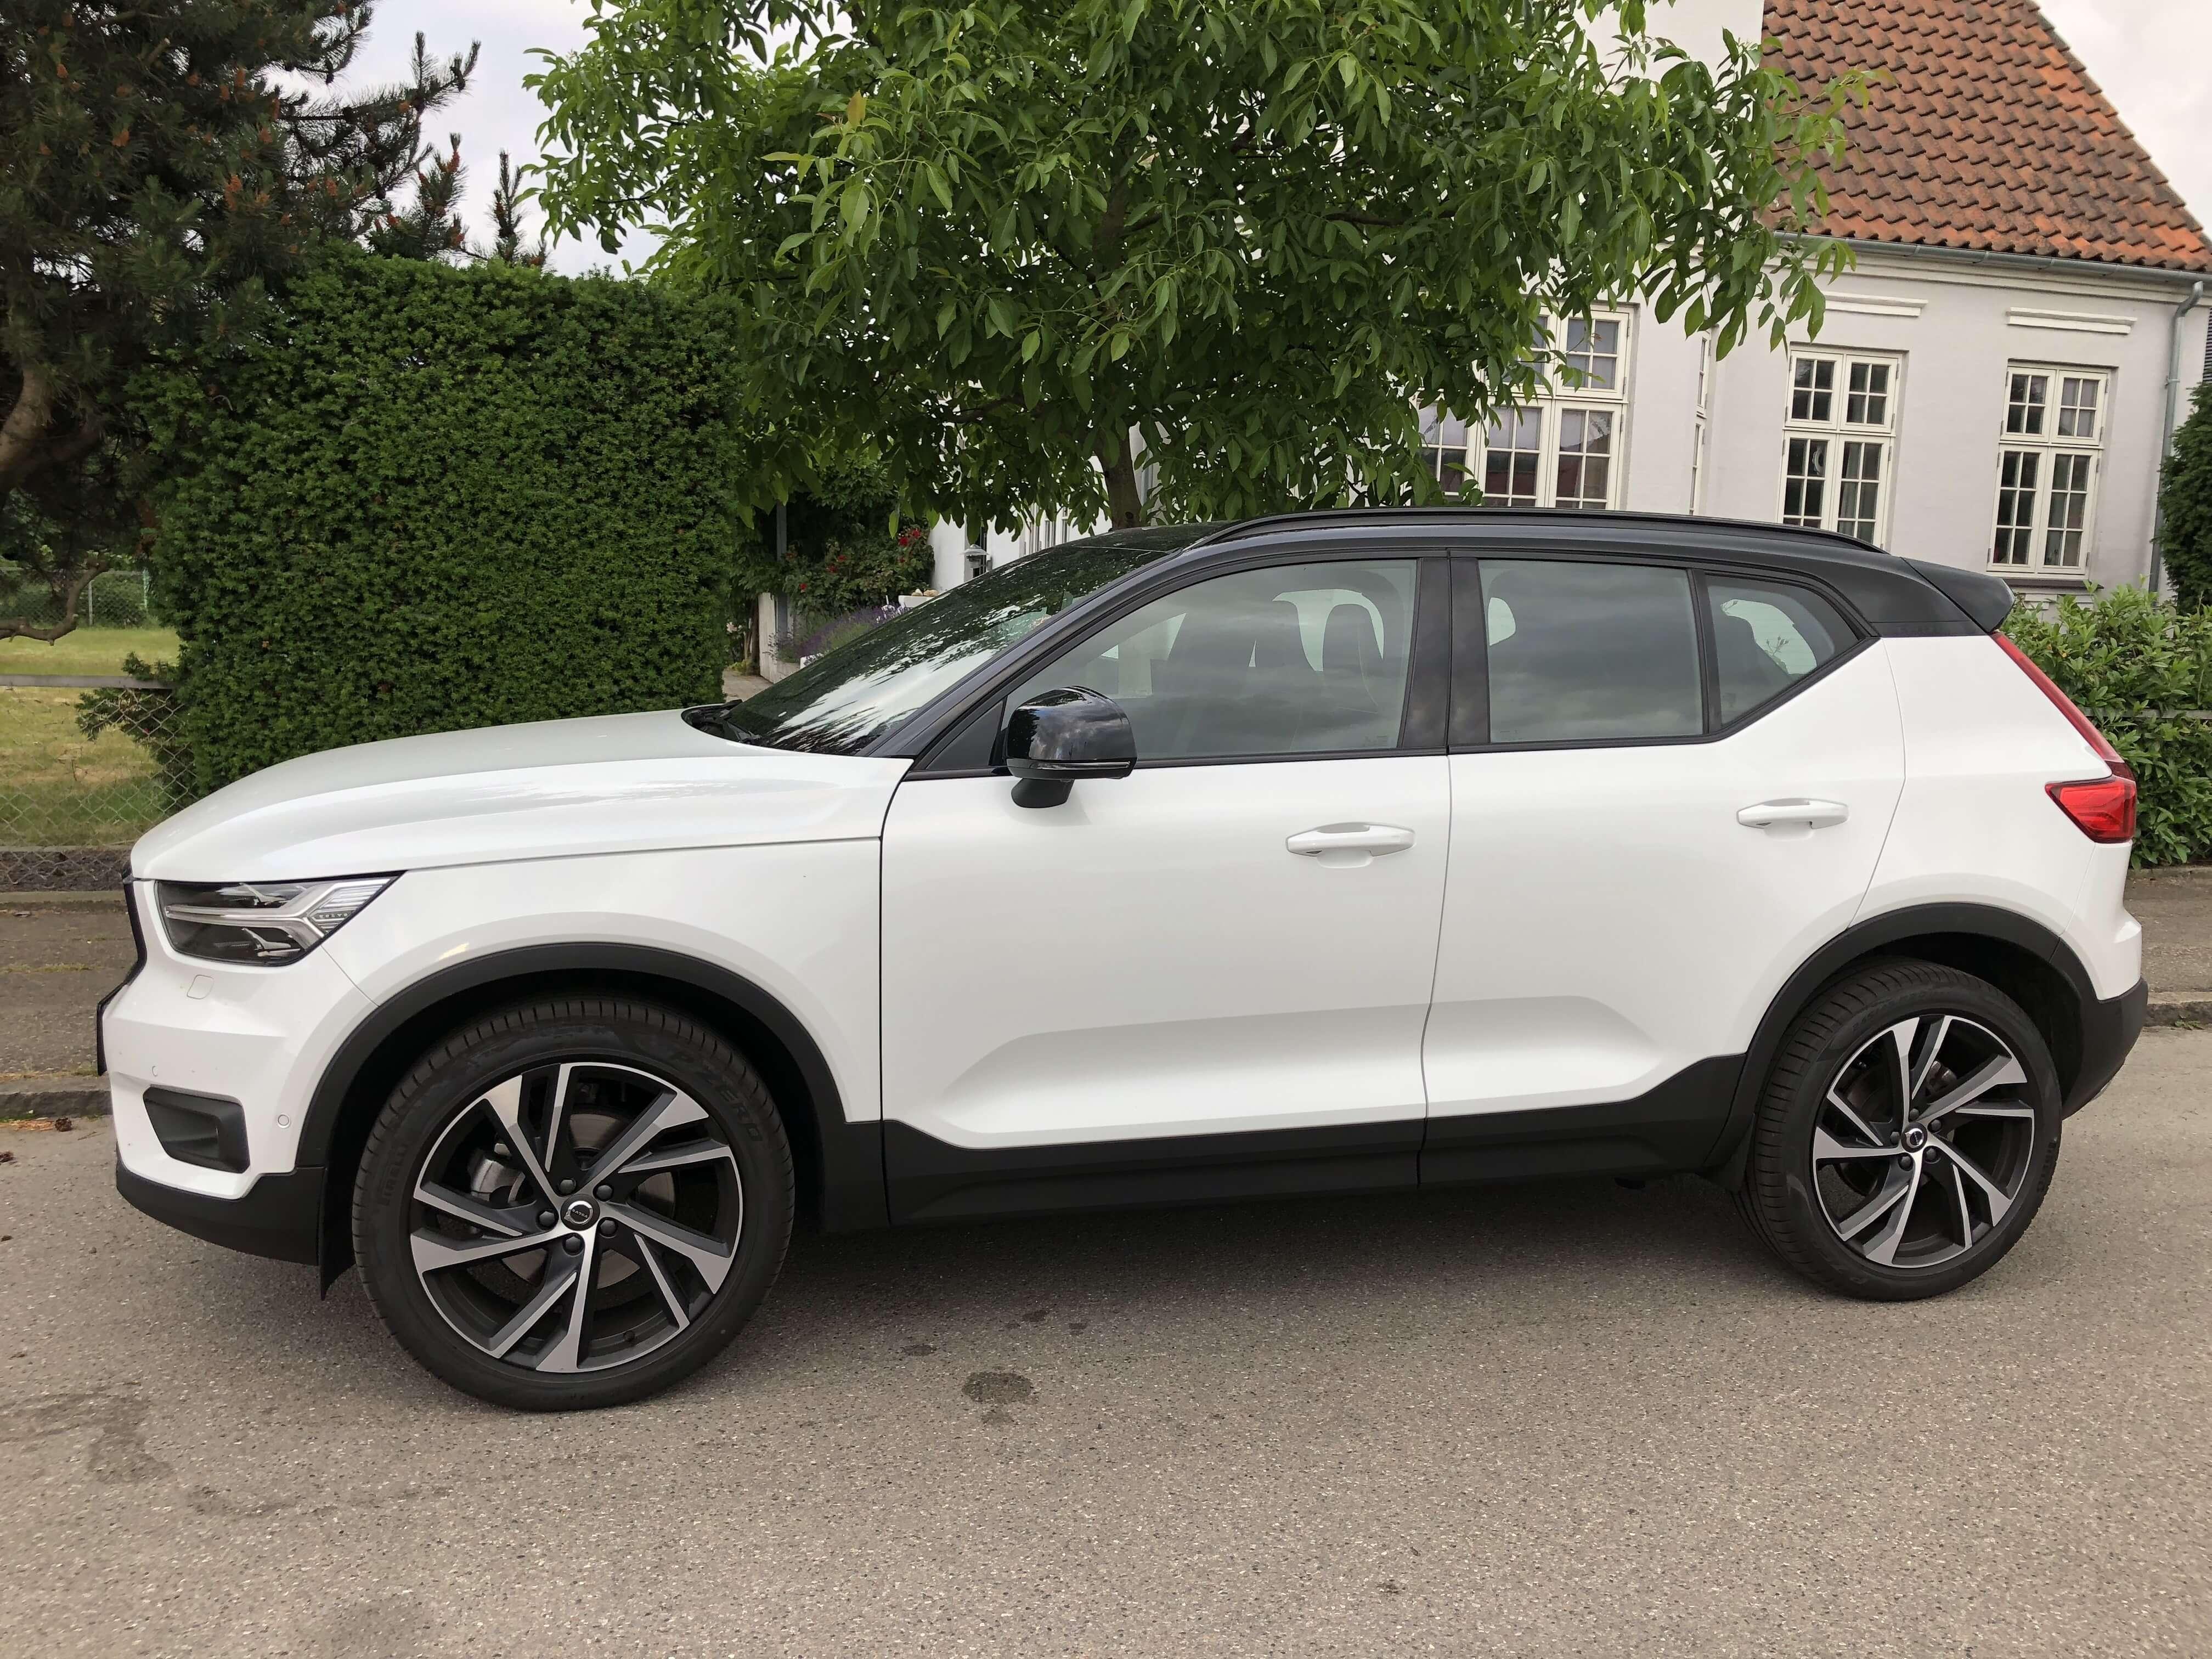 Vi er vilde med Volvos lille crossover